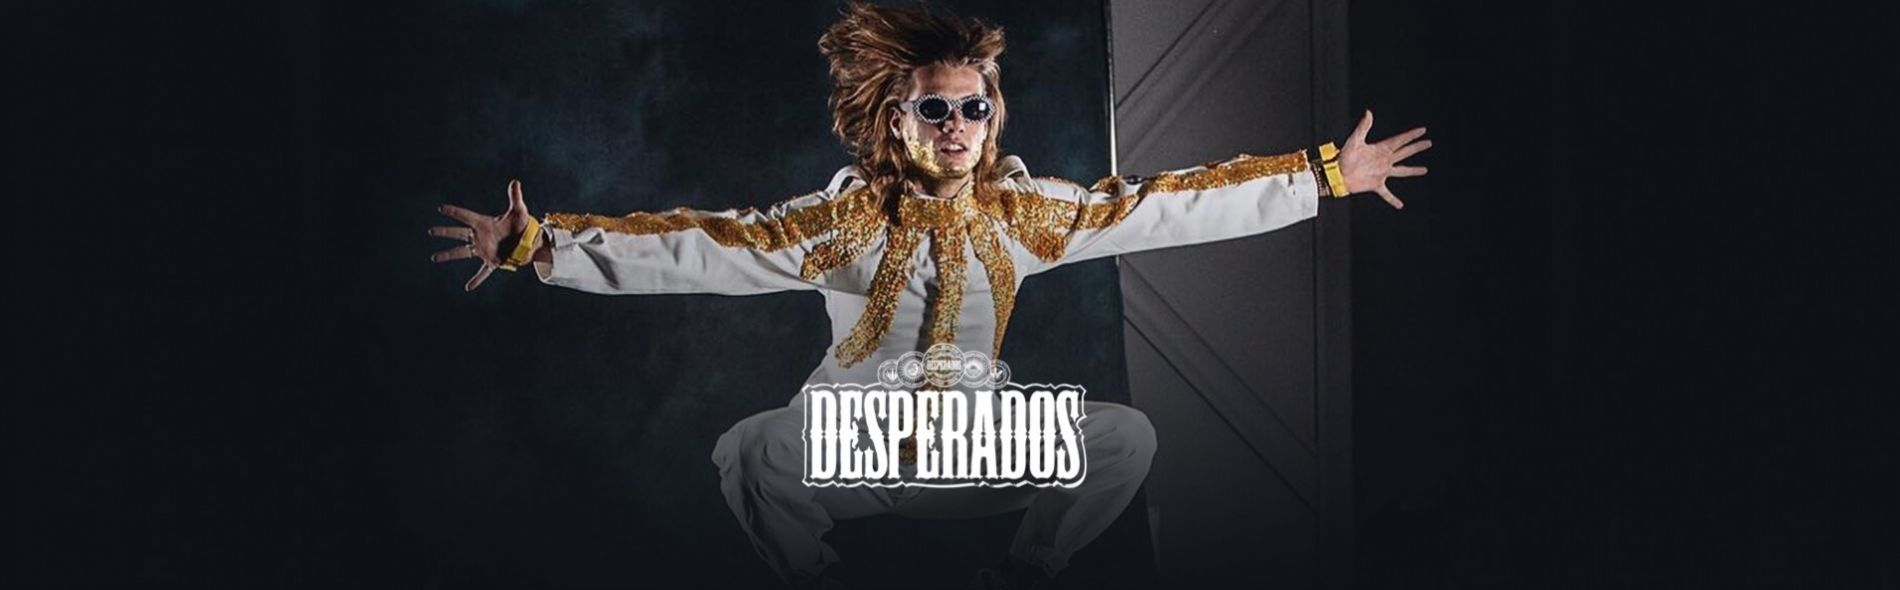 Tony Junior's Vegas trip with Desperados' 'Bass Drop Experiment'